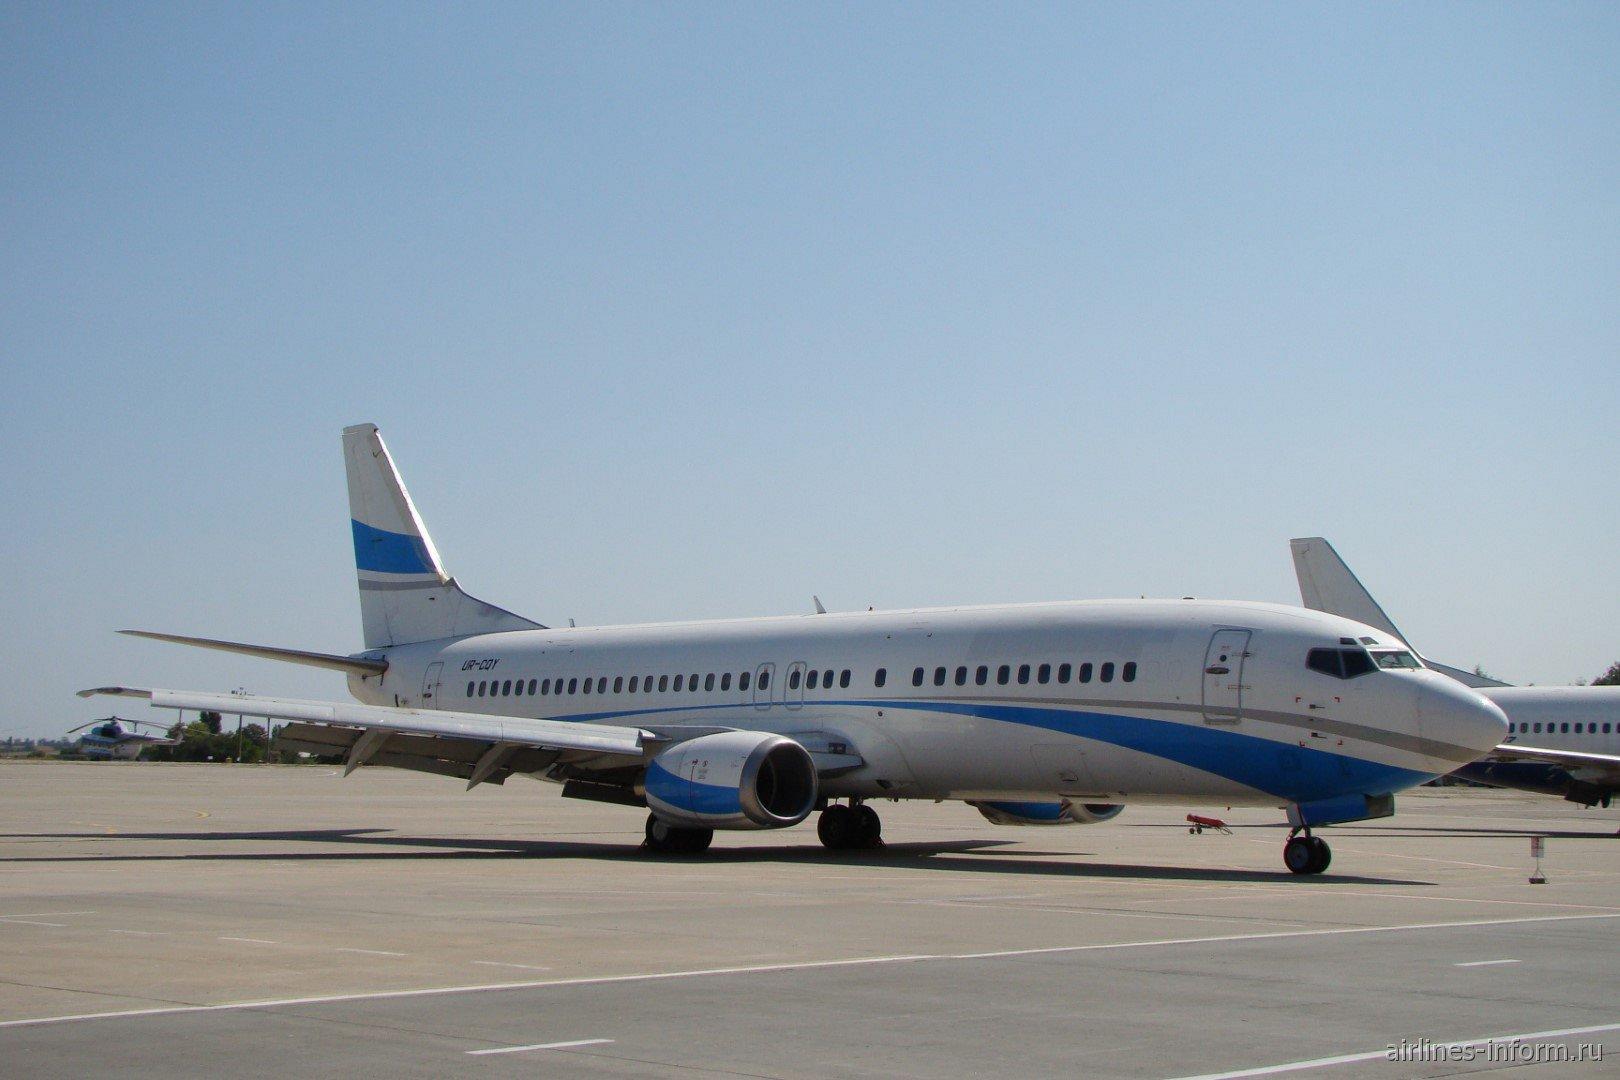 Самолет Boeing 737-400 UR-CQY авиакомпании Jonika в аэропорту Харькова